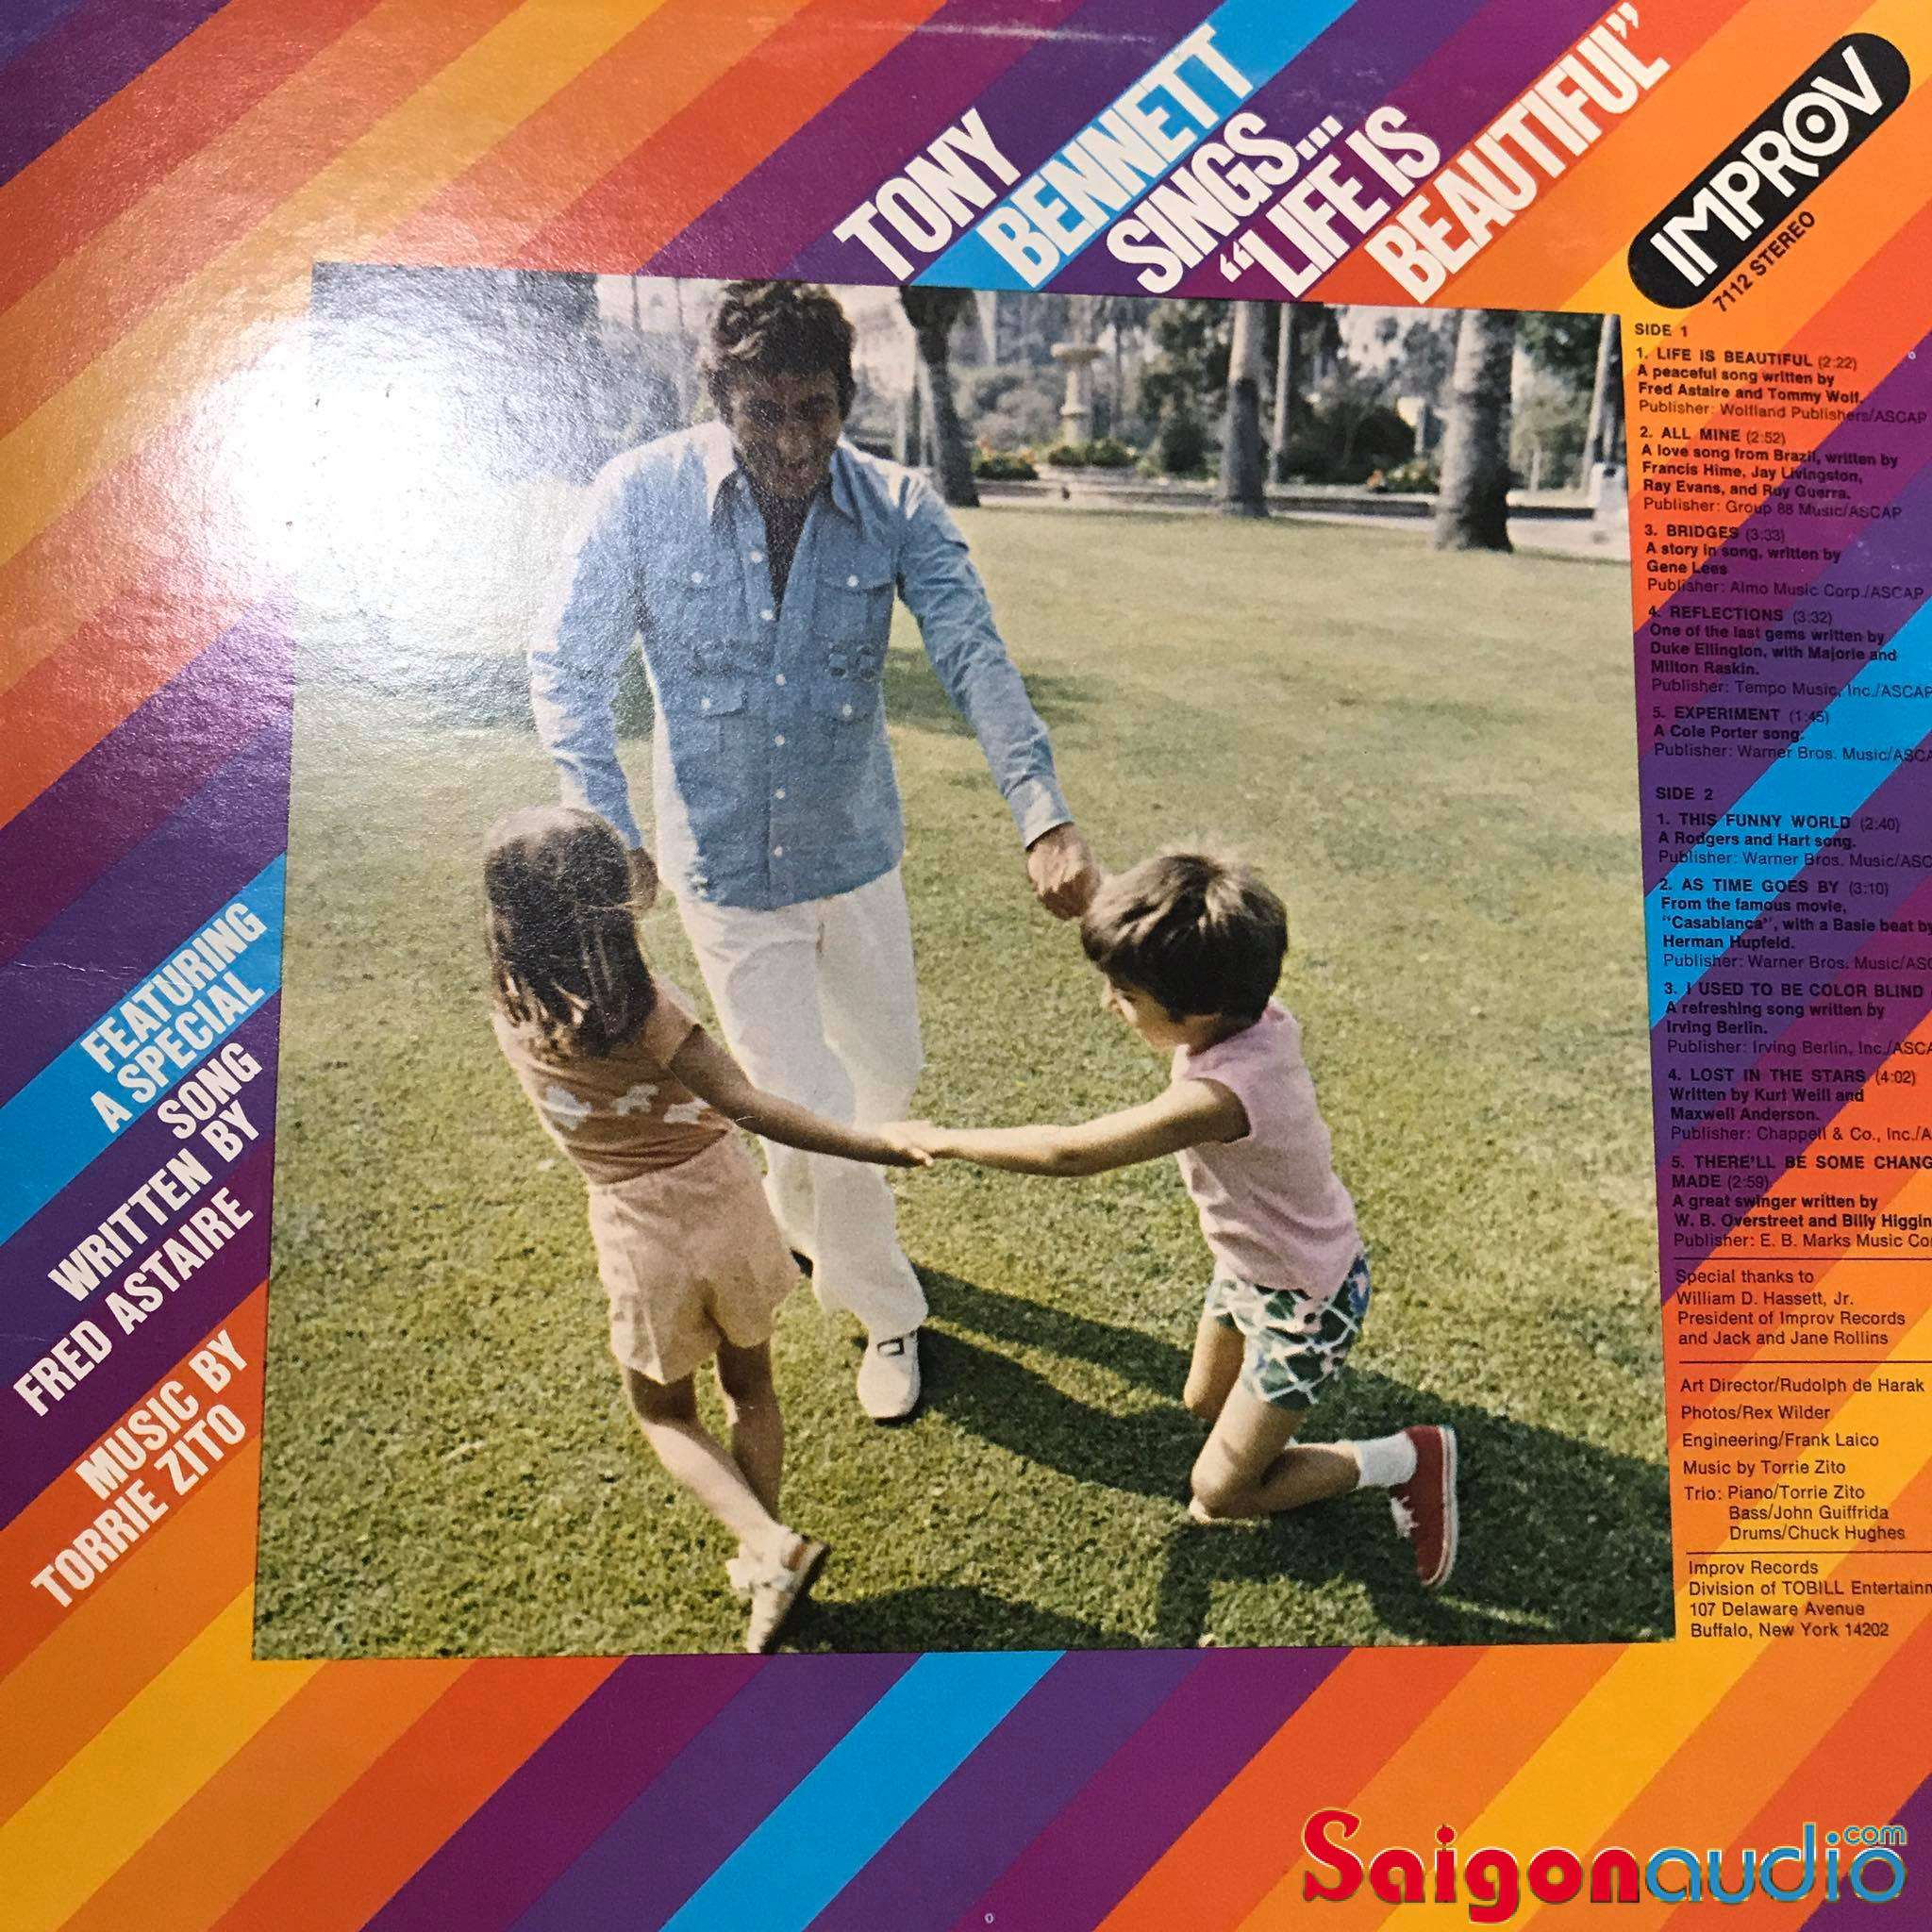 Đĩa than LP Tony Bennett Sings... Life Is Beautiful (1975)